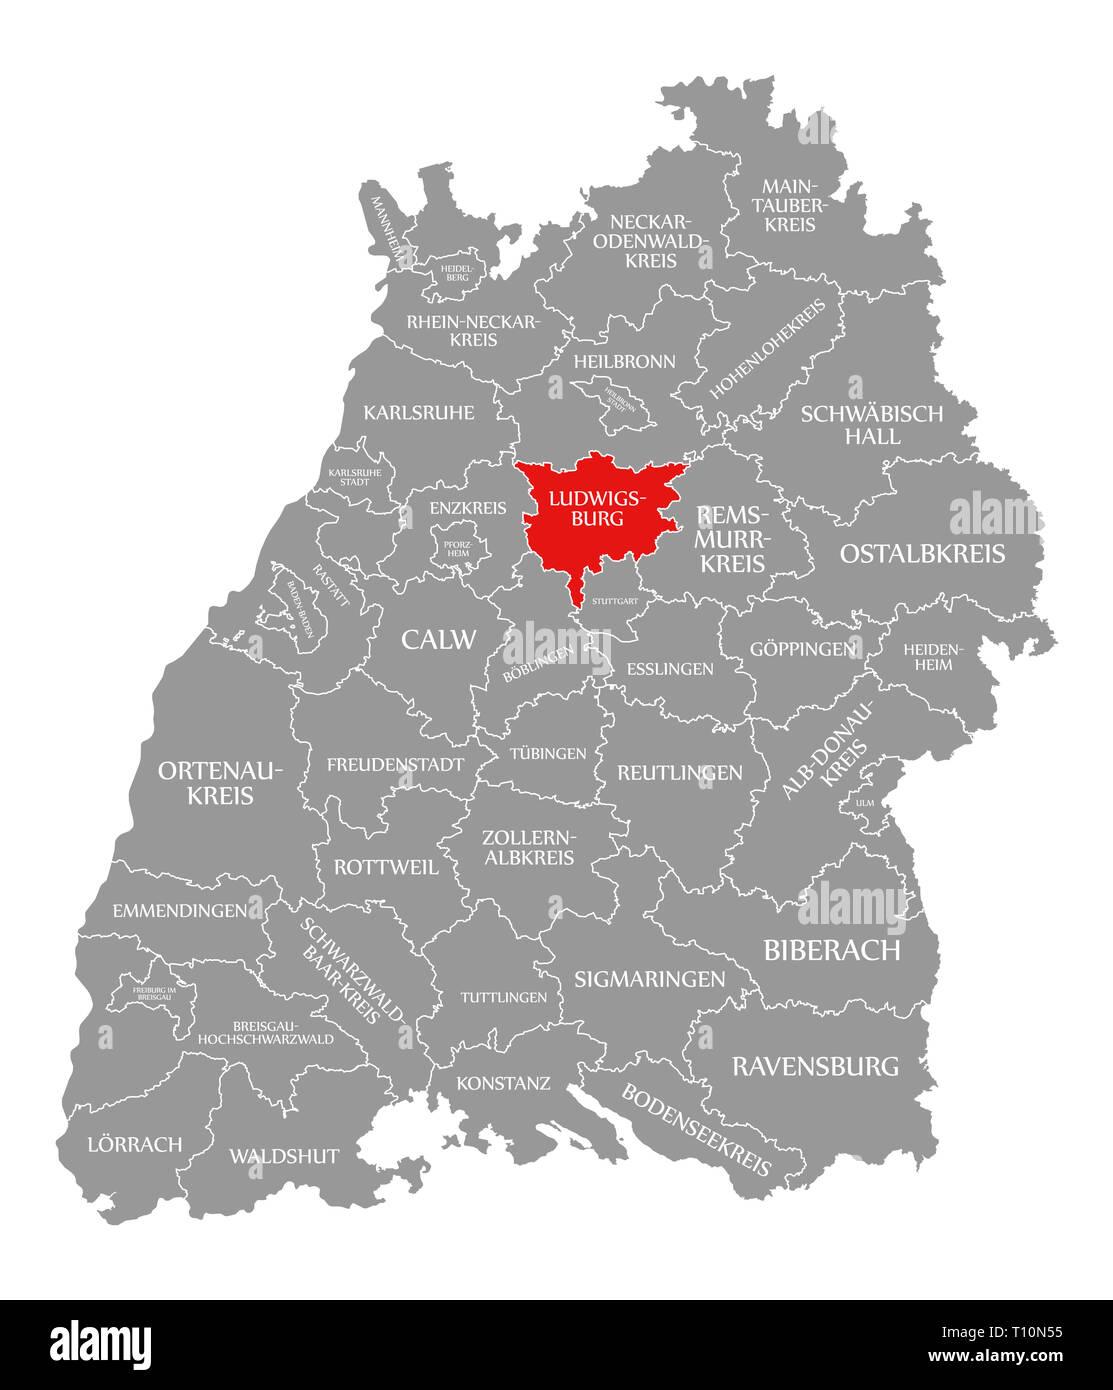 Kreis Ludwigsburg In Rot Hervorgehoben Karte Von Baden Wurttemberg